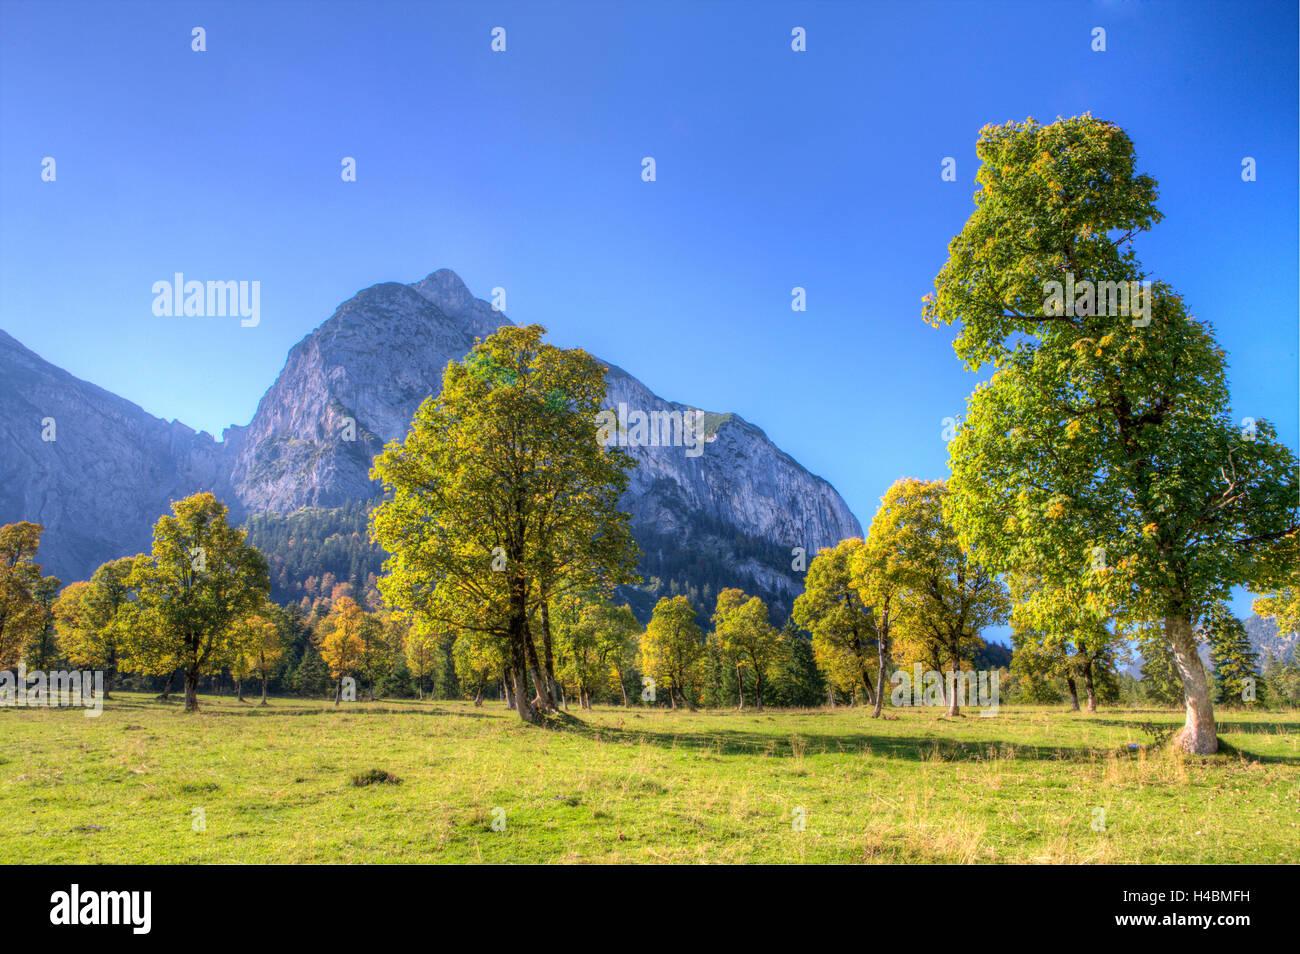 Große Ahornböden, Engtal, Eng, Tyrol, Austria, Alpenpark Karwendel, harewood, - Stock Image